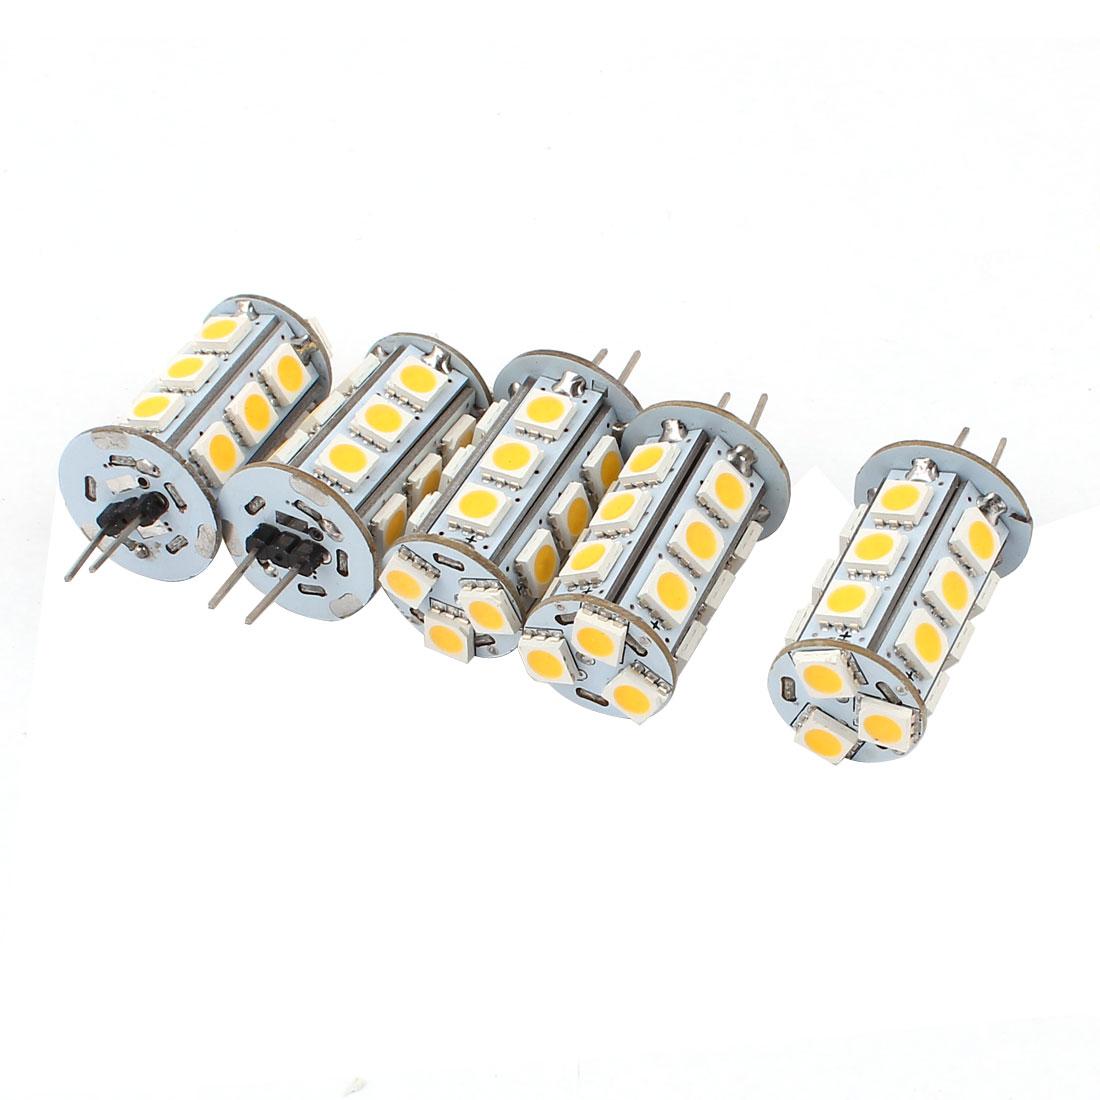 5 x 250-270Lm Energy Saving G4 5050 SMD 18 LED Light Bulb Lamp Warm White